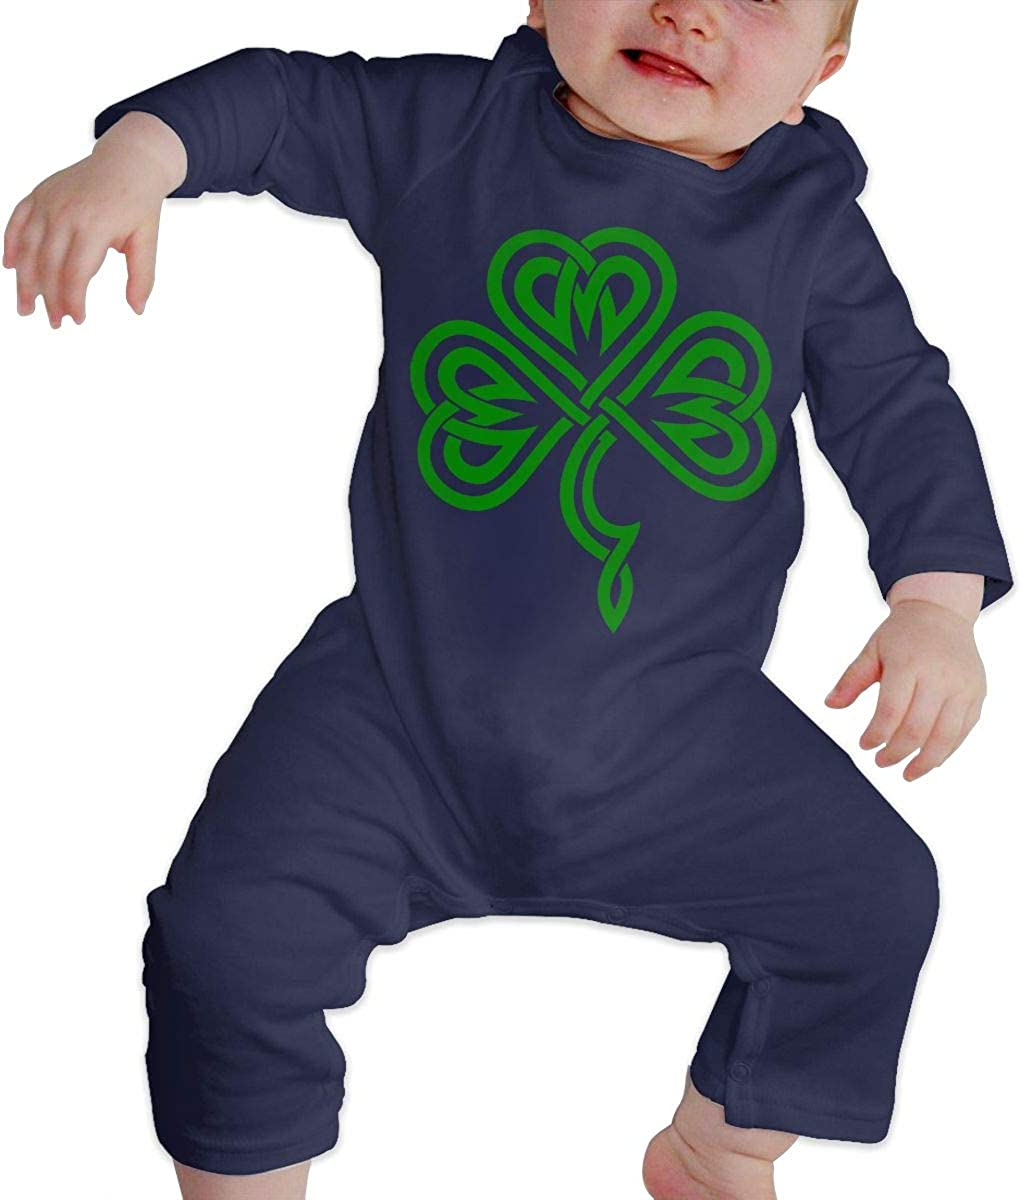 Distressed Irish St Paddys Day Shamrock Child Fashion Jumpsuit Bodysuit Jumpsuit Outfits Jumpsuit Casual Clothing